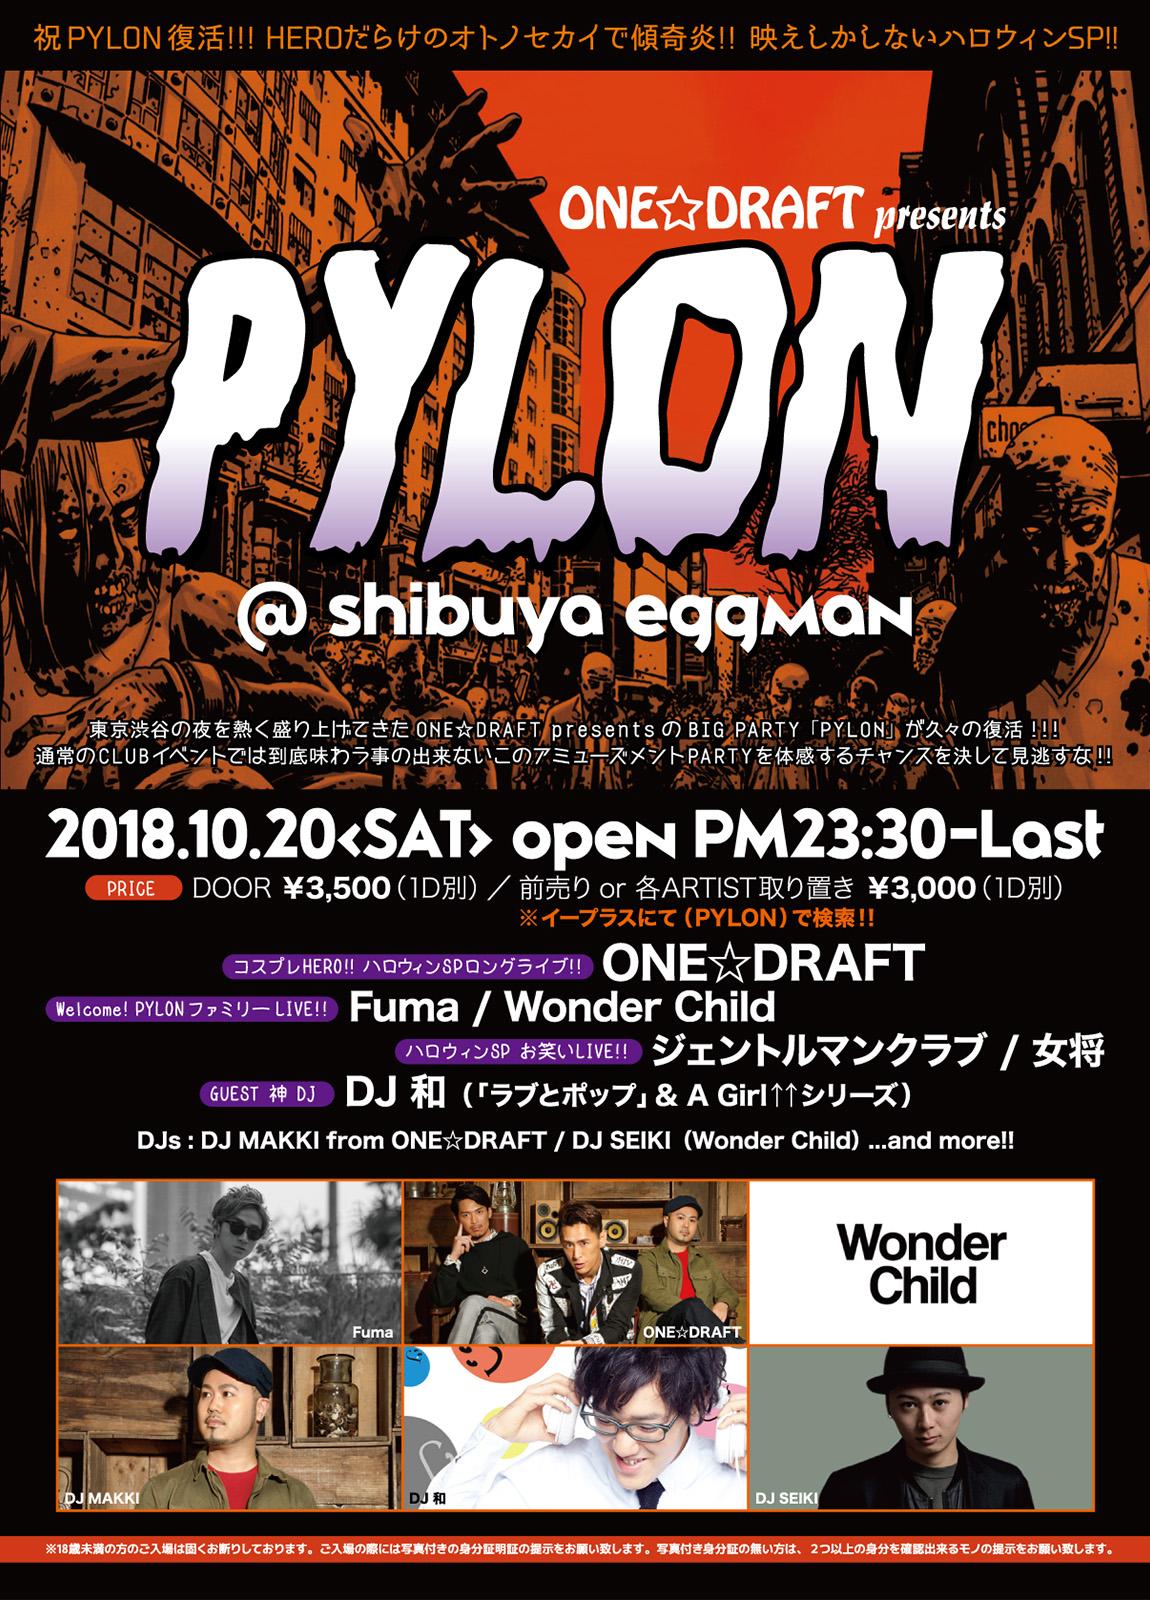 ONE☆DRAFT presents 『PYLON』vol.19<br>〜祝 PYLON 復活!!! HEROだらけのオトノセカイで傾奇炎!! 映えしかしないハロウィンSP!!〜